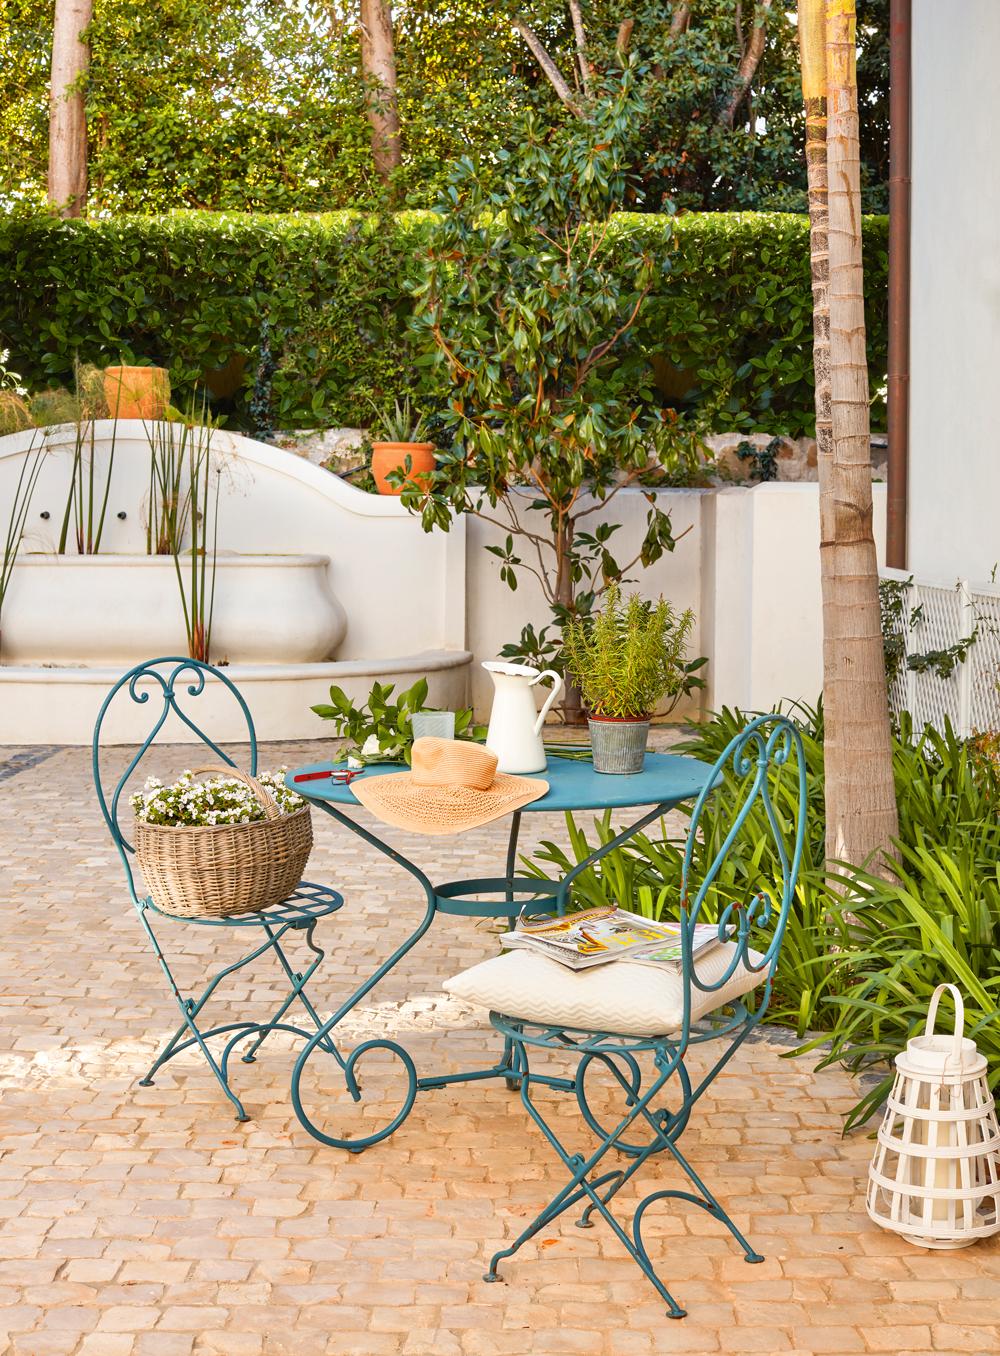 C mo conseguir una terraza perfecta - Fuentes para terraza ...